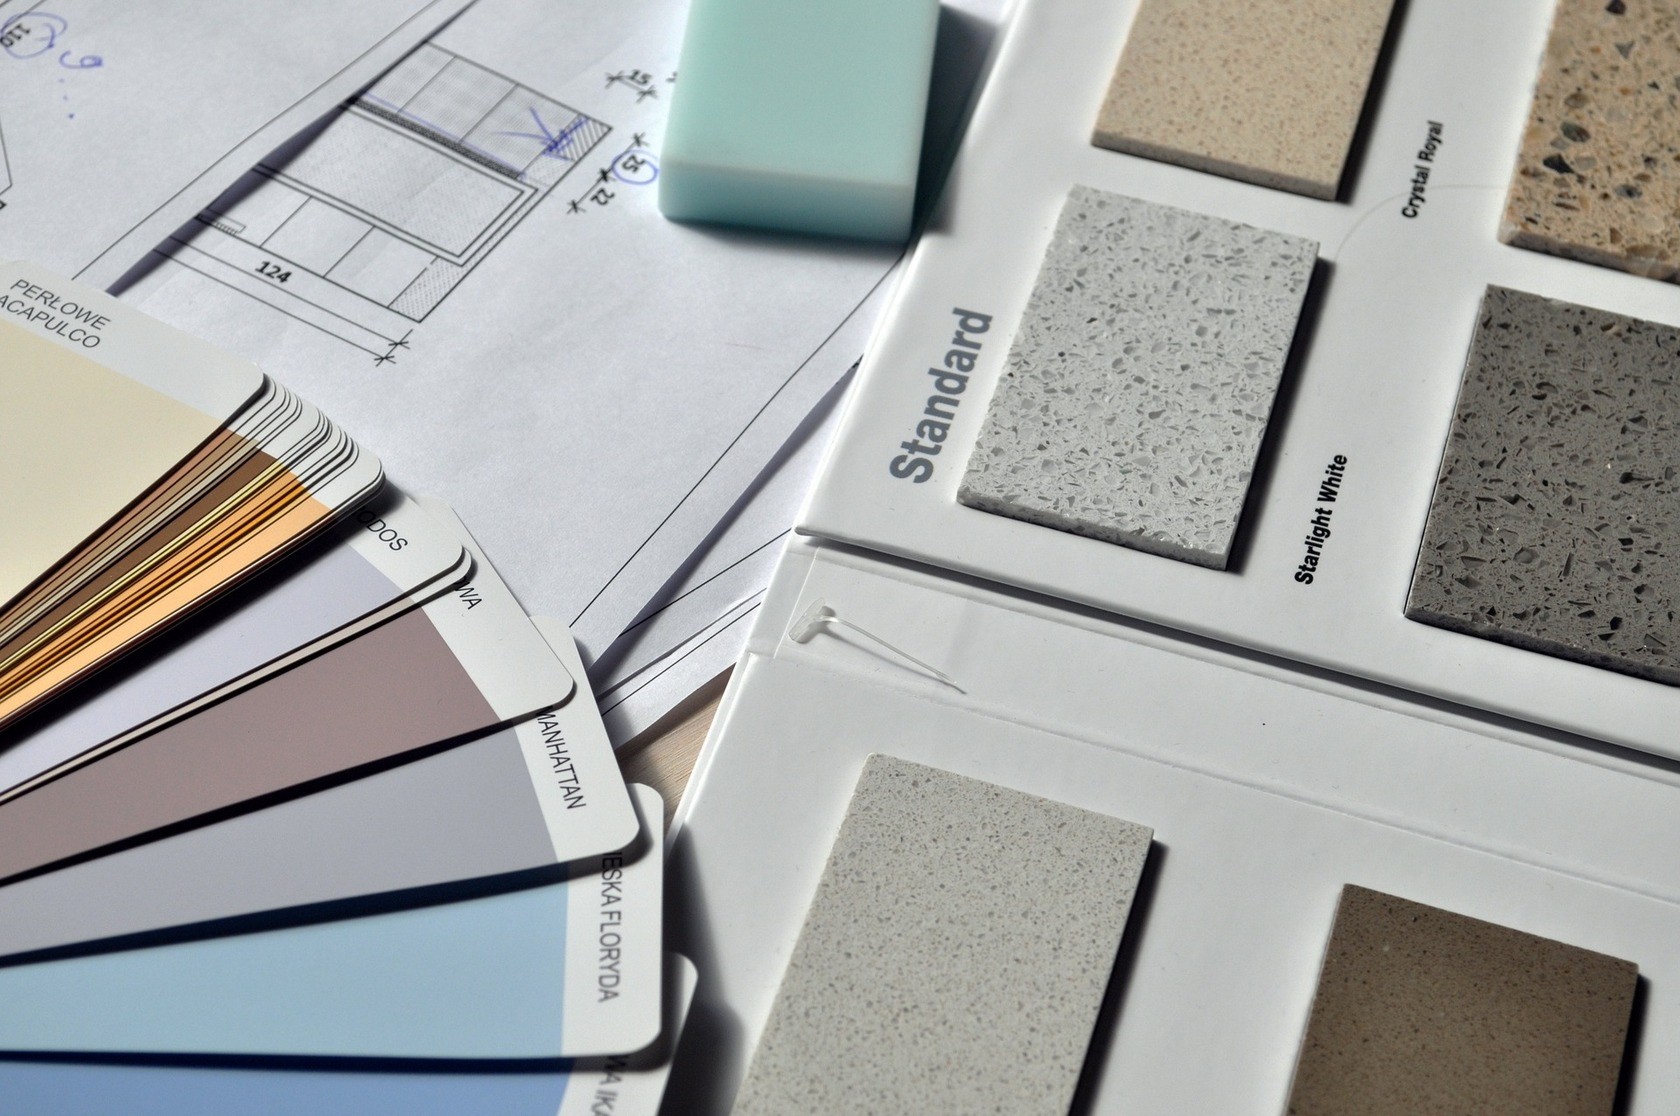 uspesna-spolupraca-interierovy-architekt-vzorkovnik-farieb-materialov-projekt-02